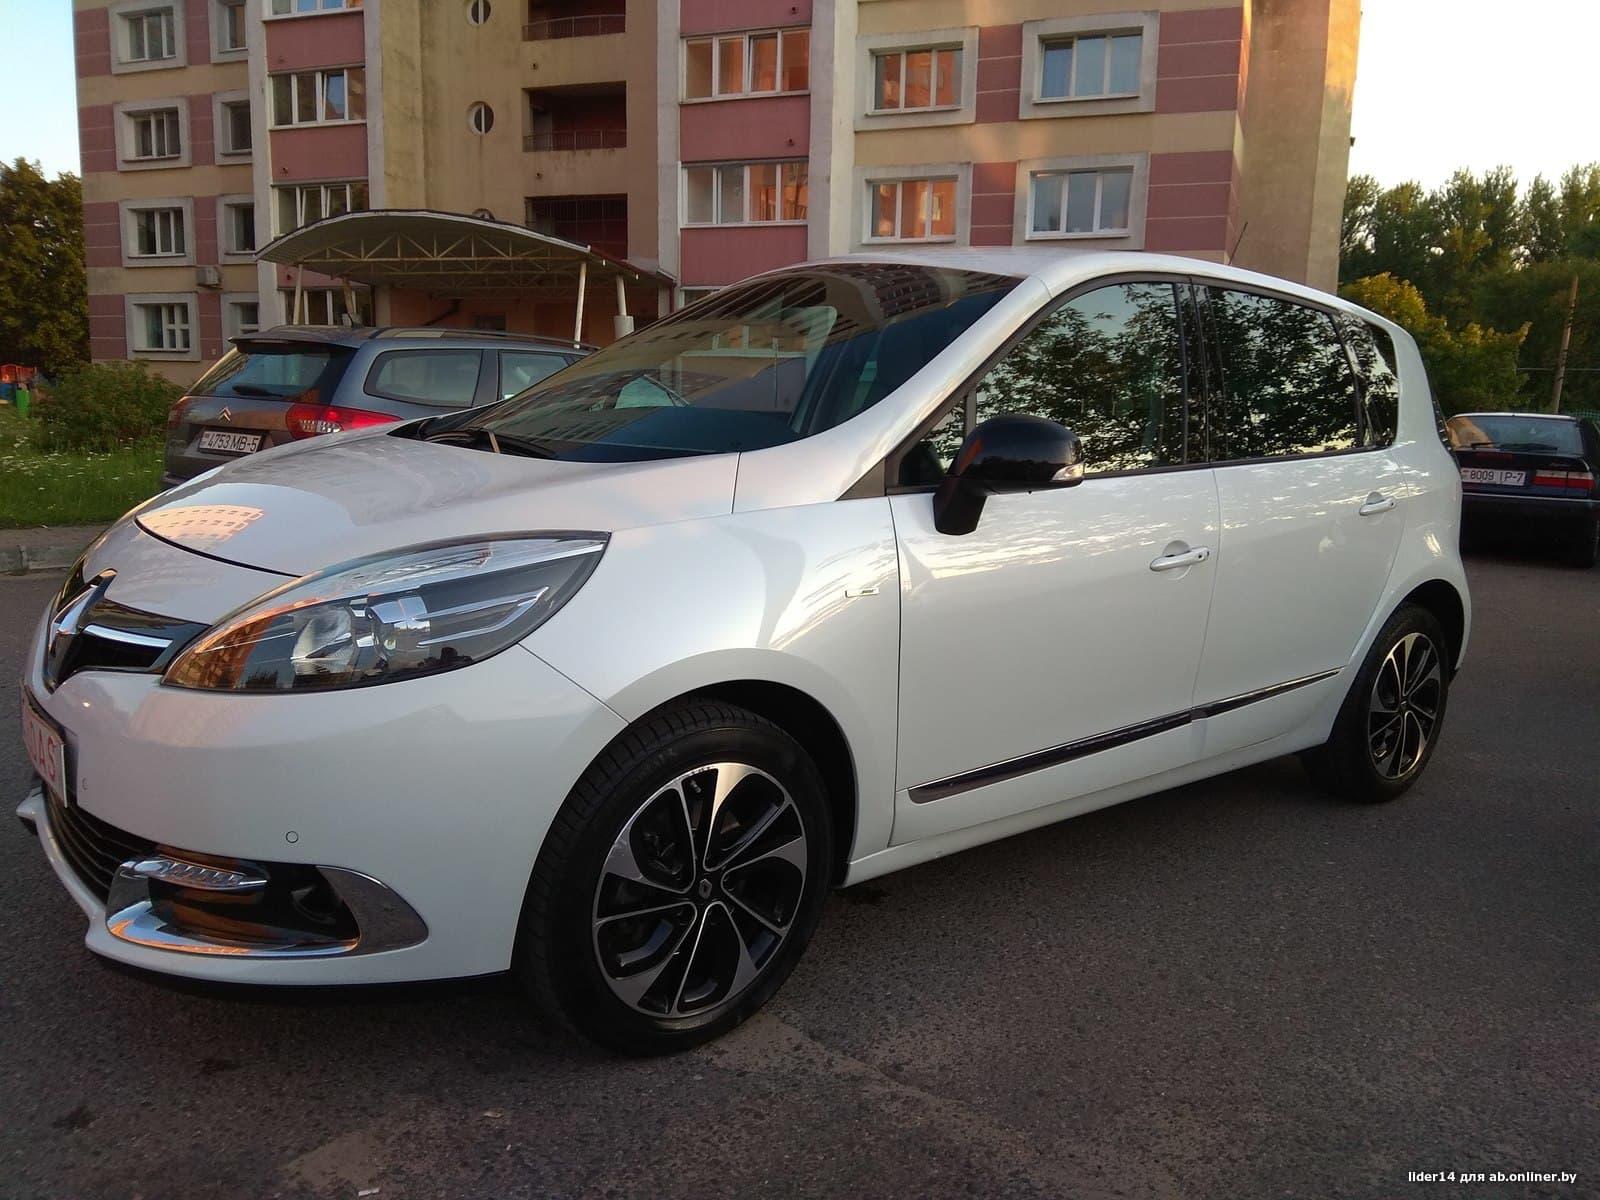 Renault Scenic BOSE